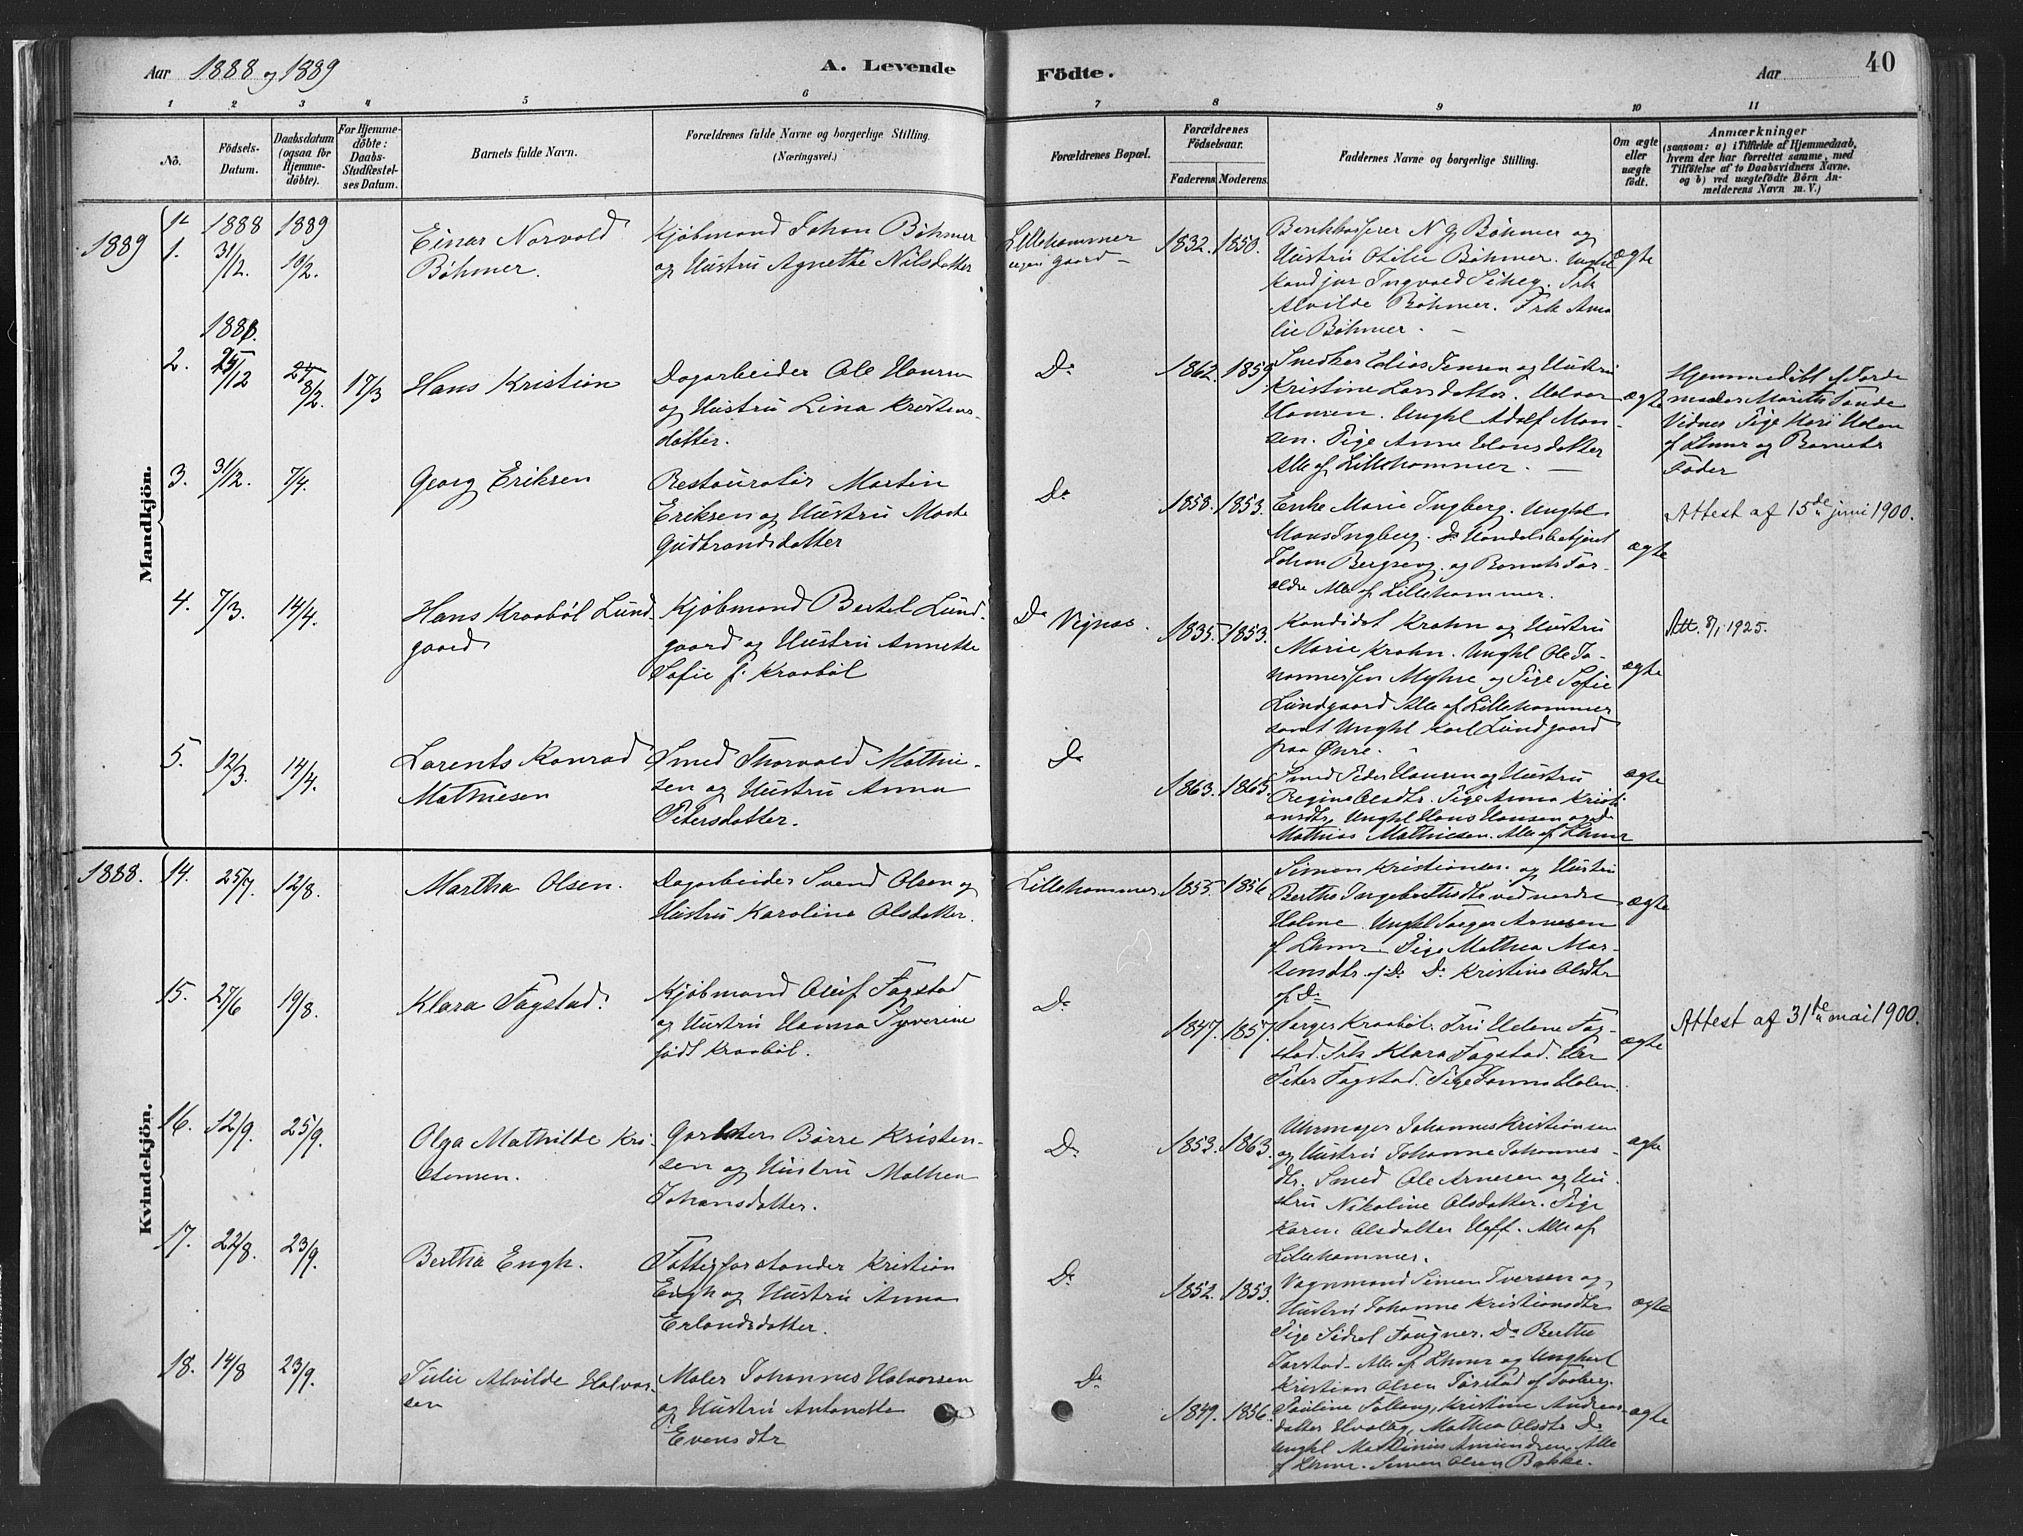 SAH, Fåberg prestekontor, H/Ha/Haa/L0010: Parish register (official) no. 10, 1879-1900, p. 40